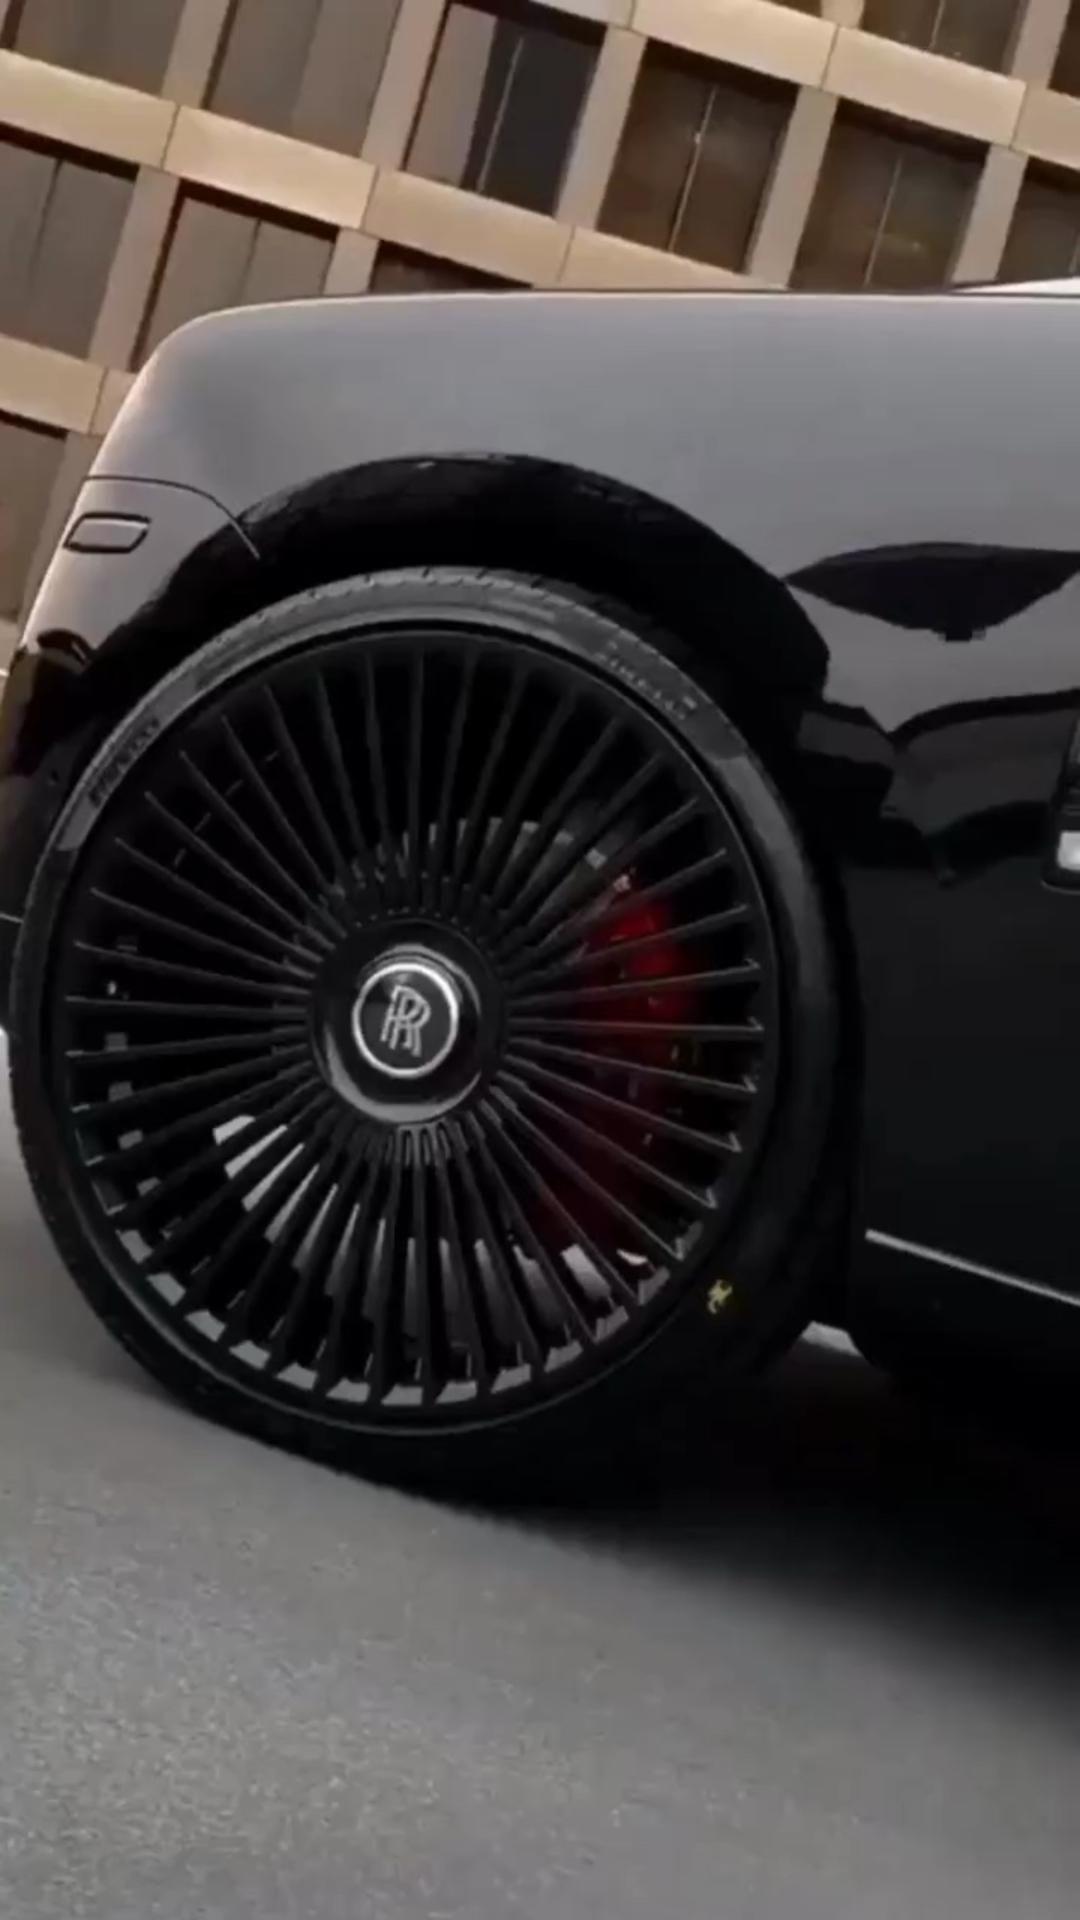 Is This Rolls-Royce Badass? 😈